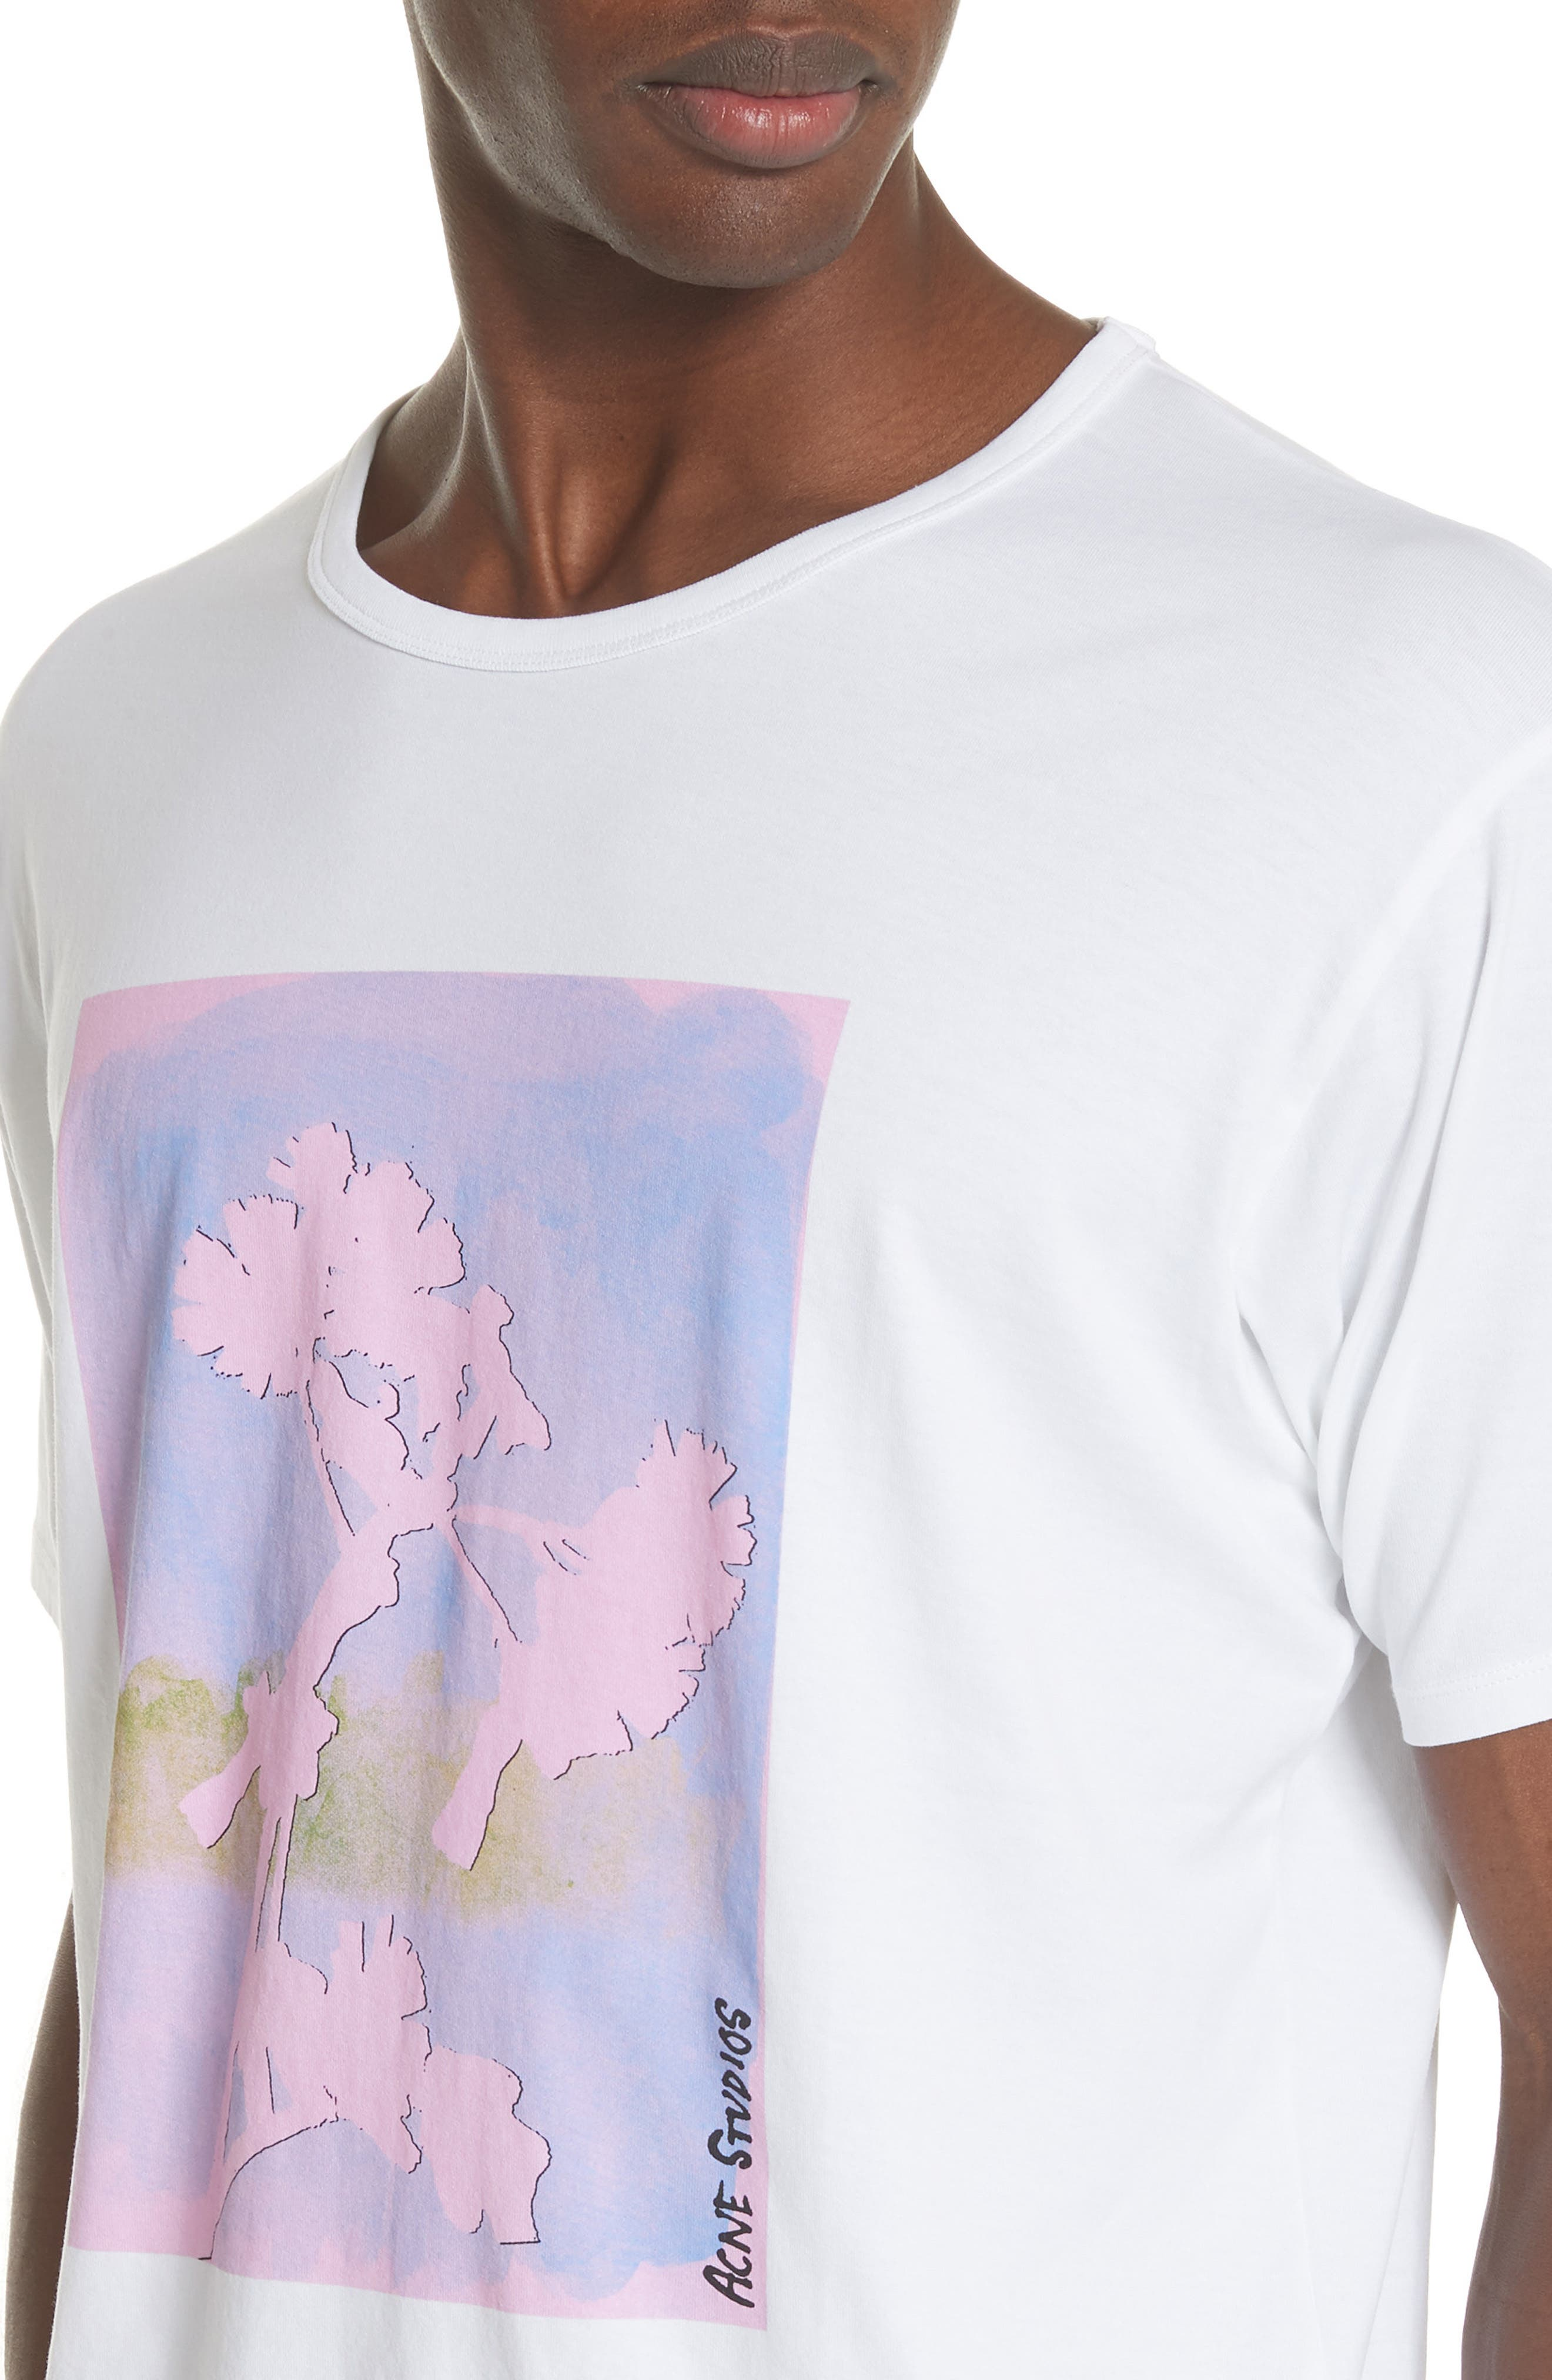 Niave Flower Graphic T-Shirt,                             Alternate thumbnail 4, color,                             100